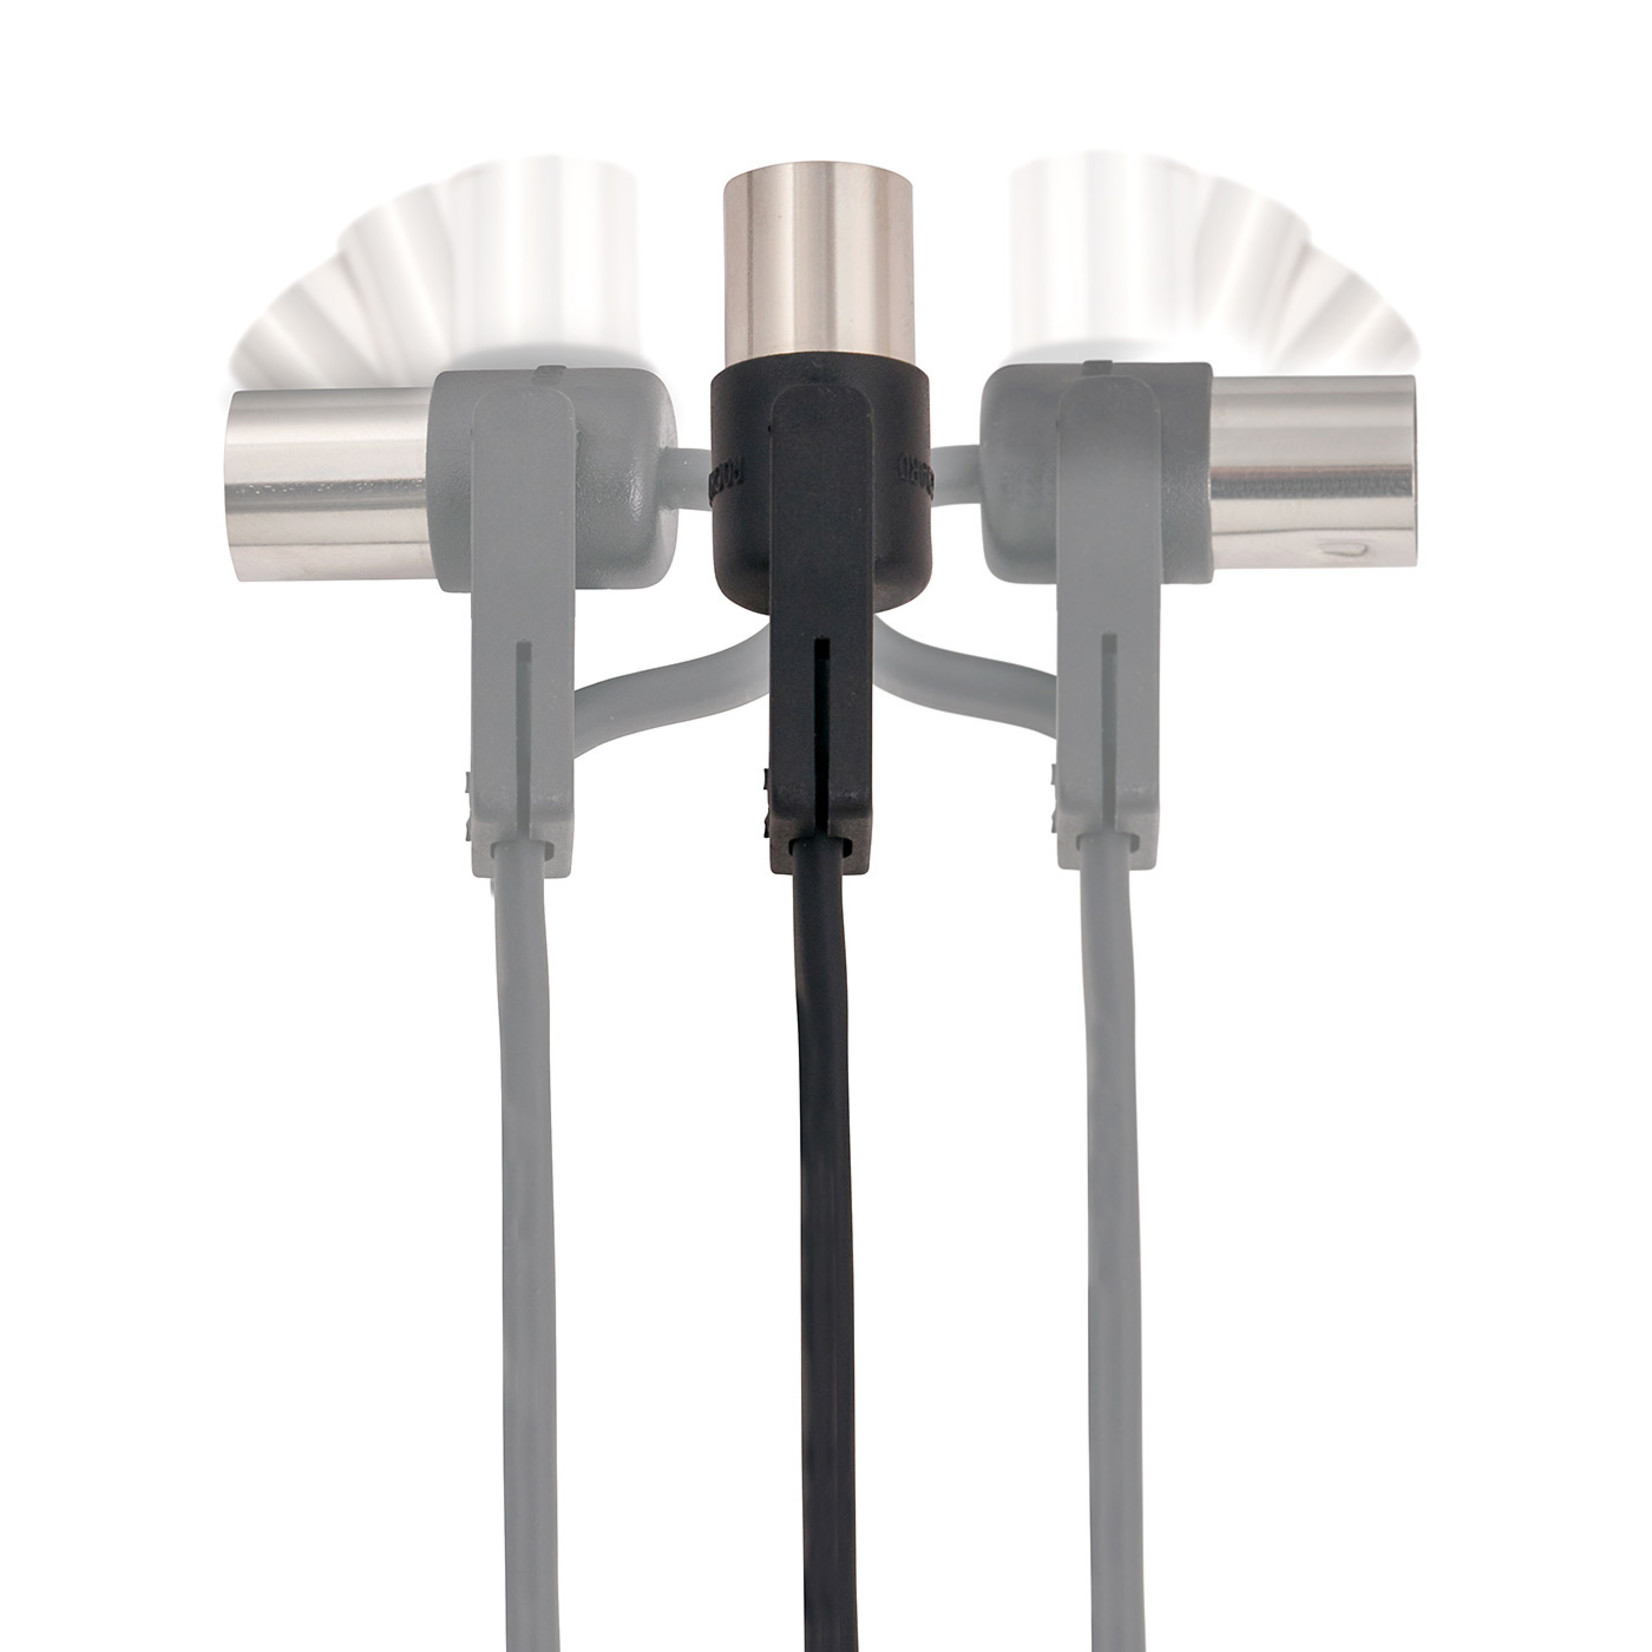 Rockboard RockBoard FlaX Plug 500cm (16.40') flat MIDI Cable - angle or straight (RBO CAB MD FX 500 BK)